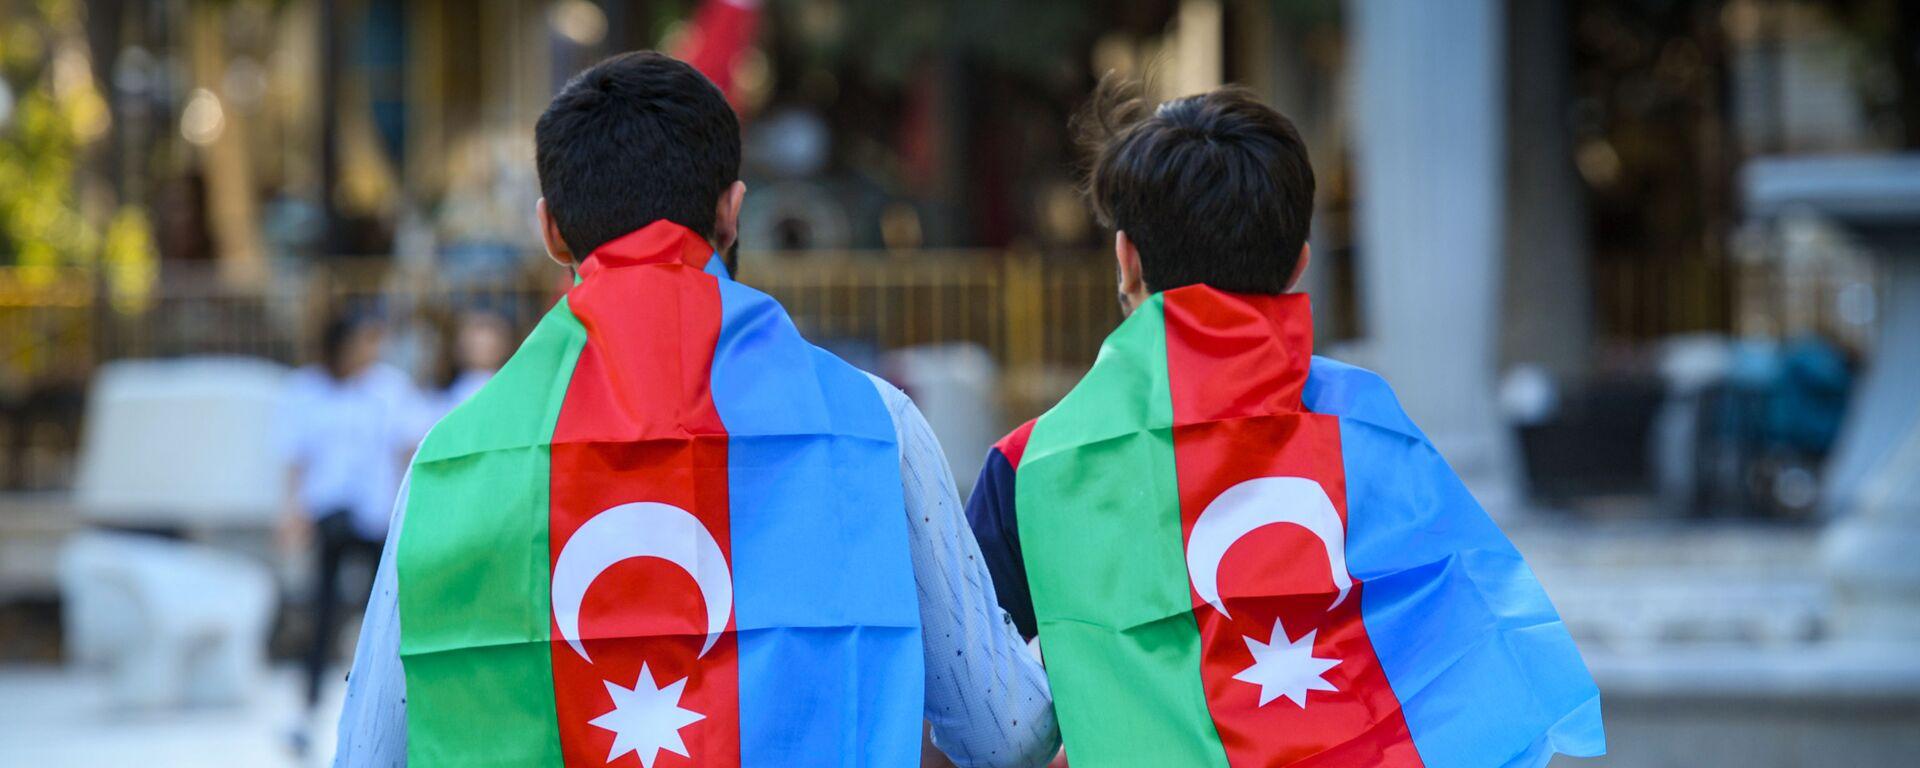 Флаги Азербайджана на улицах Баку. - Sputnik Азербайджан, 1920, 01.01.2021